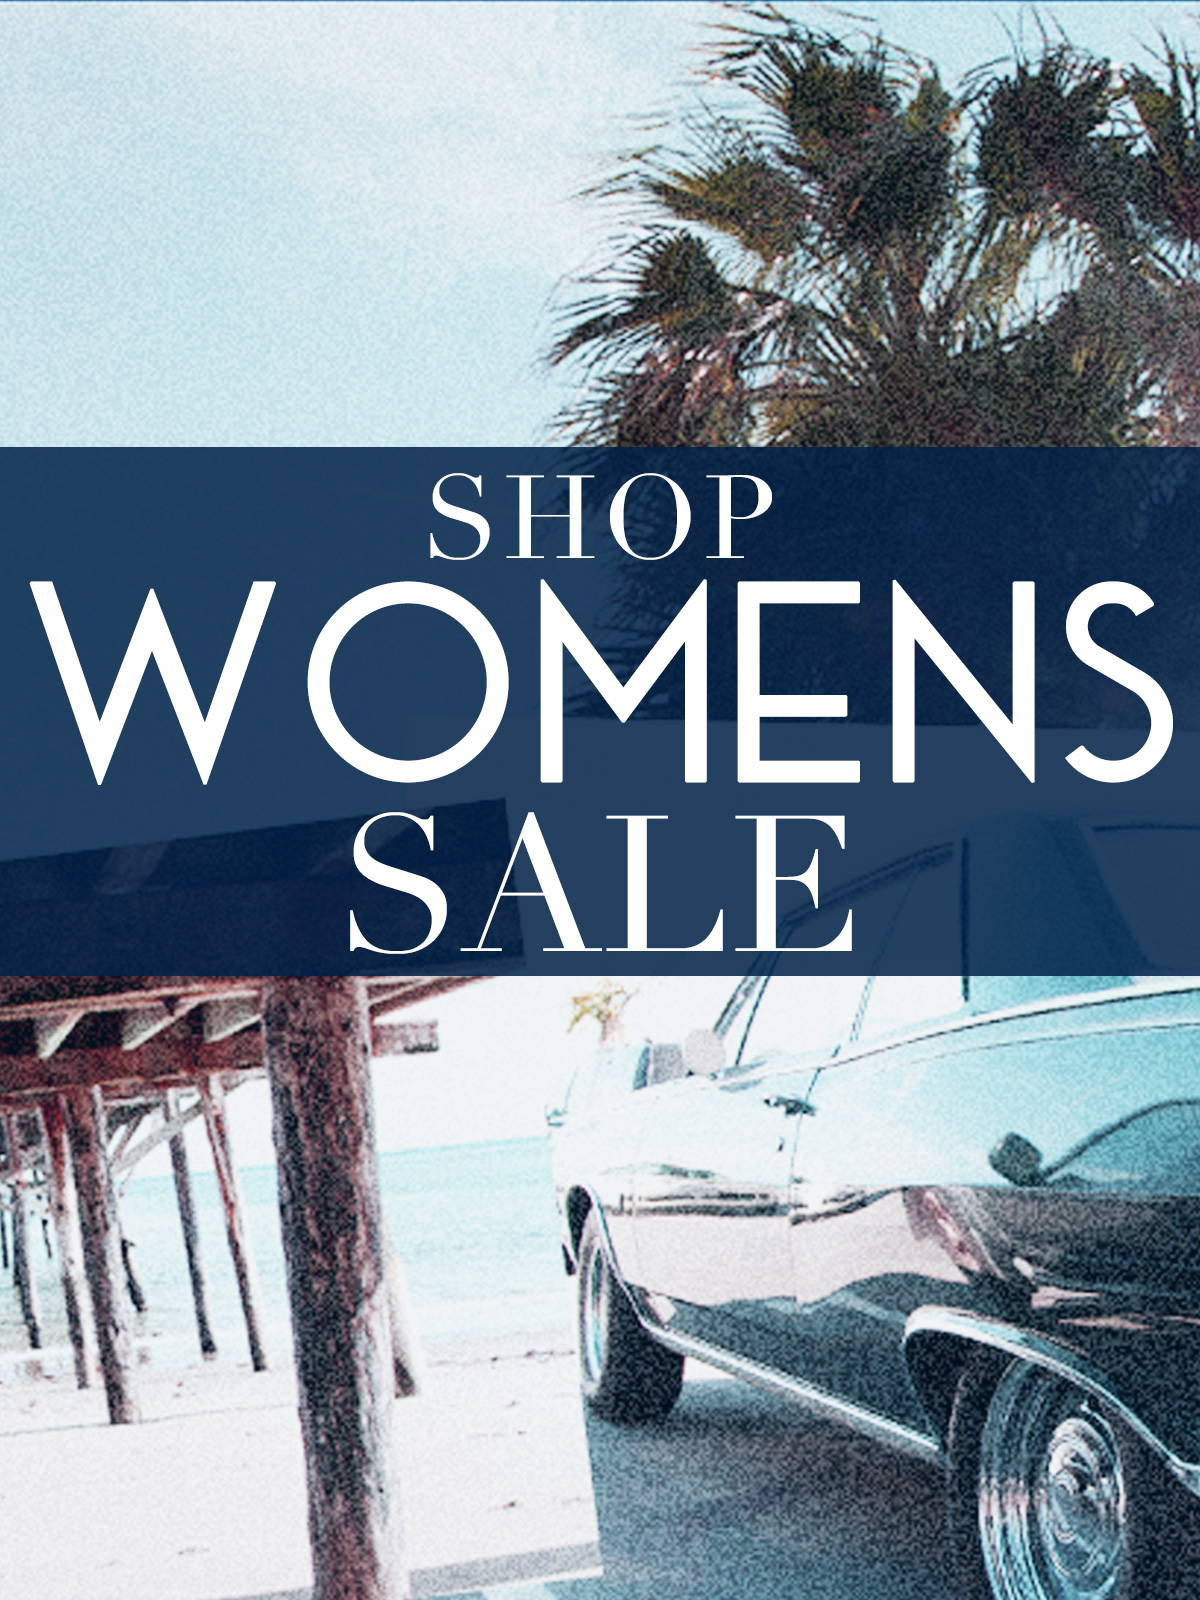 Shop the Womens 50% Off January Sale